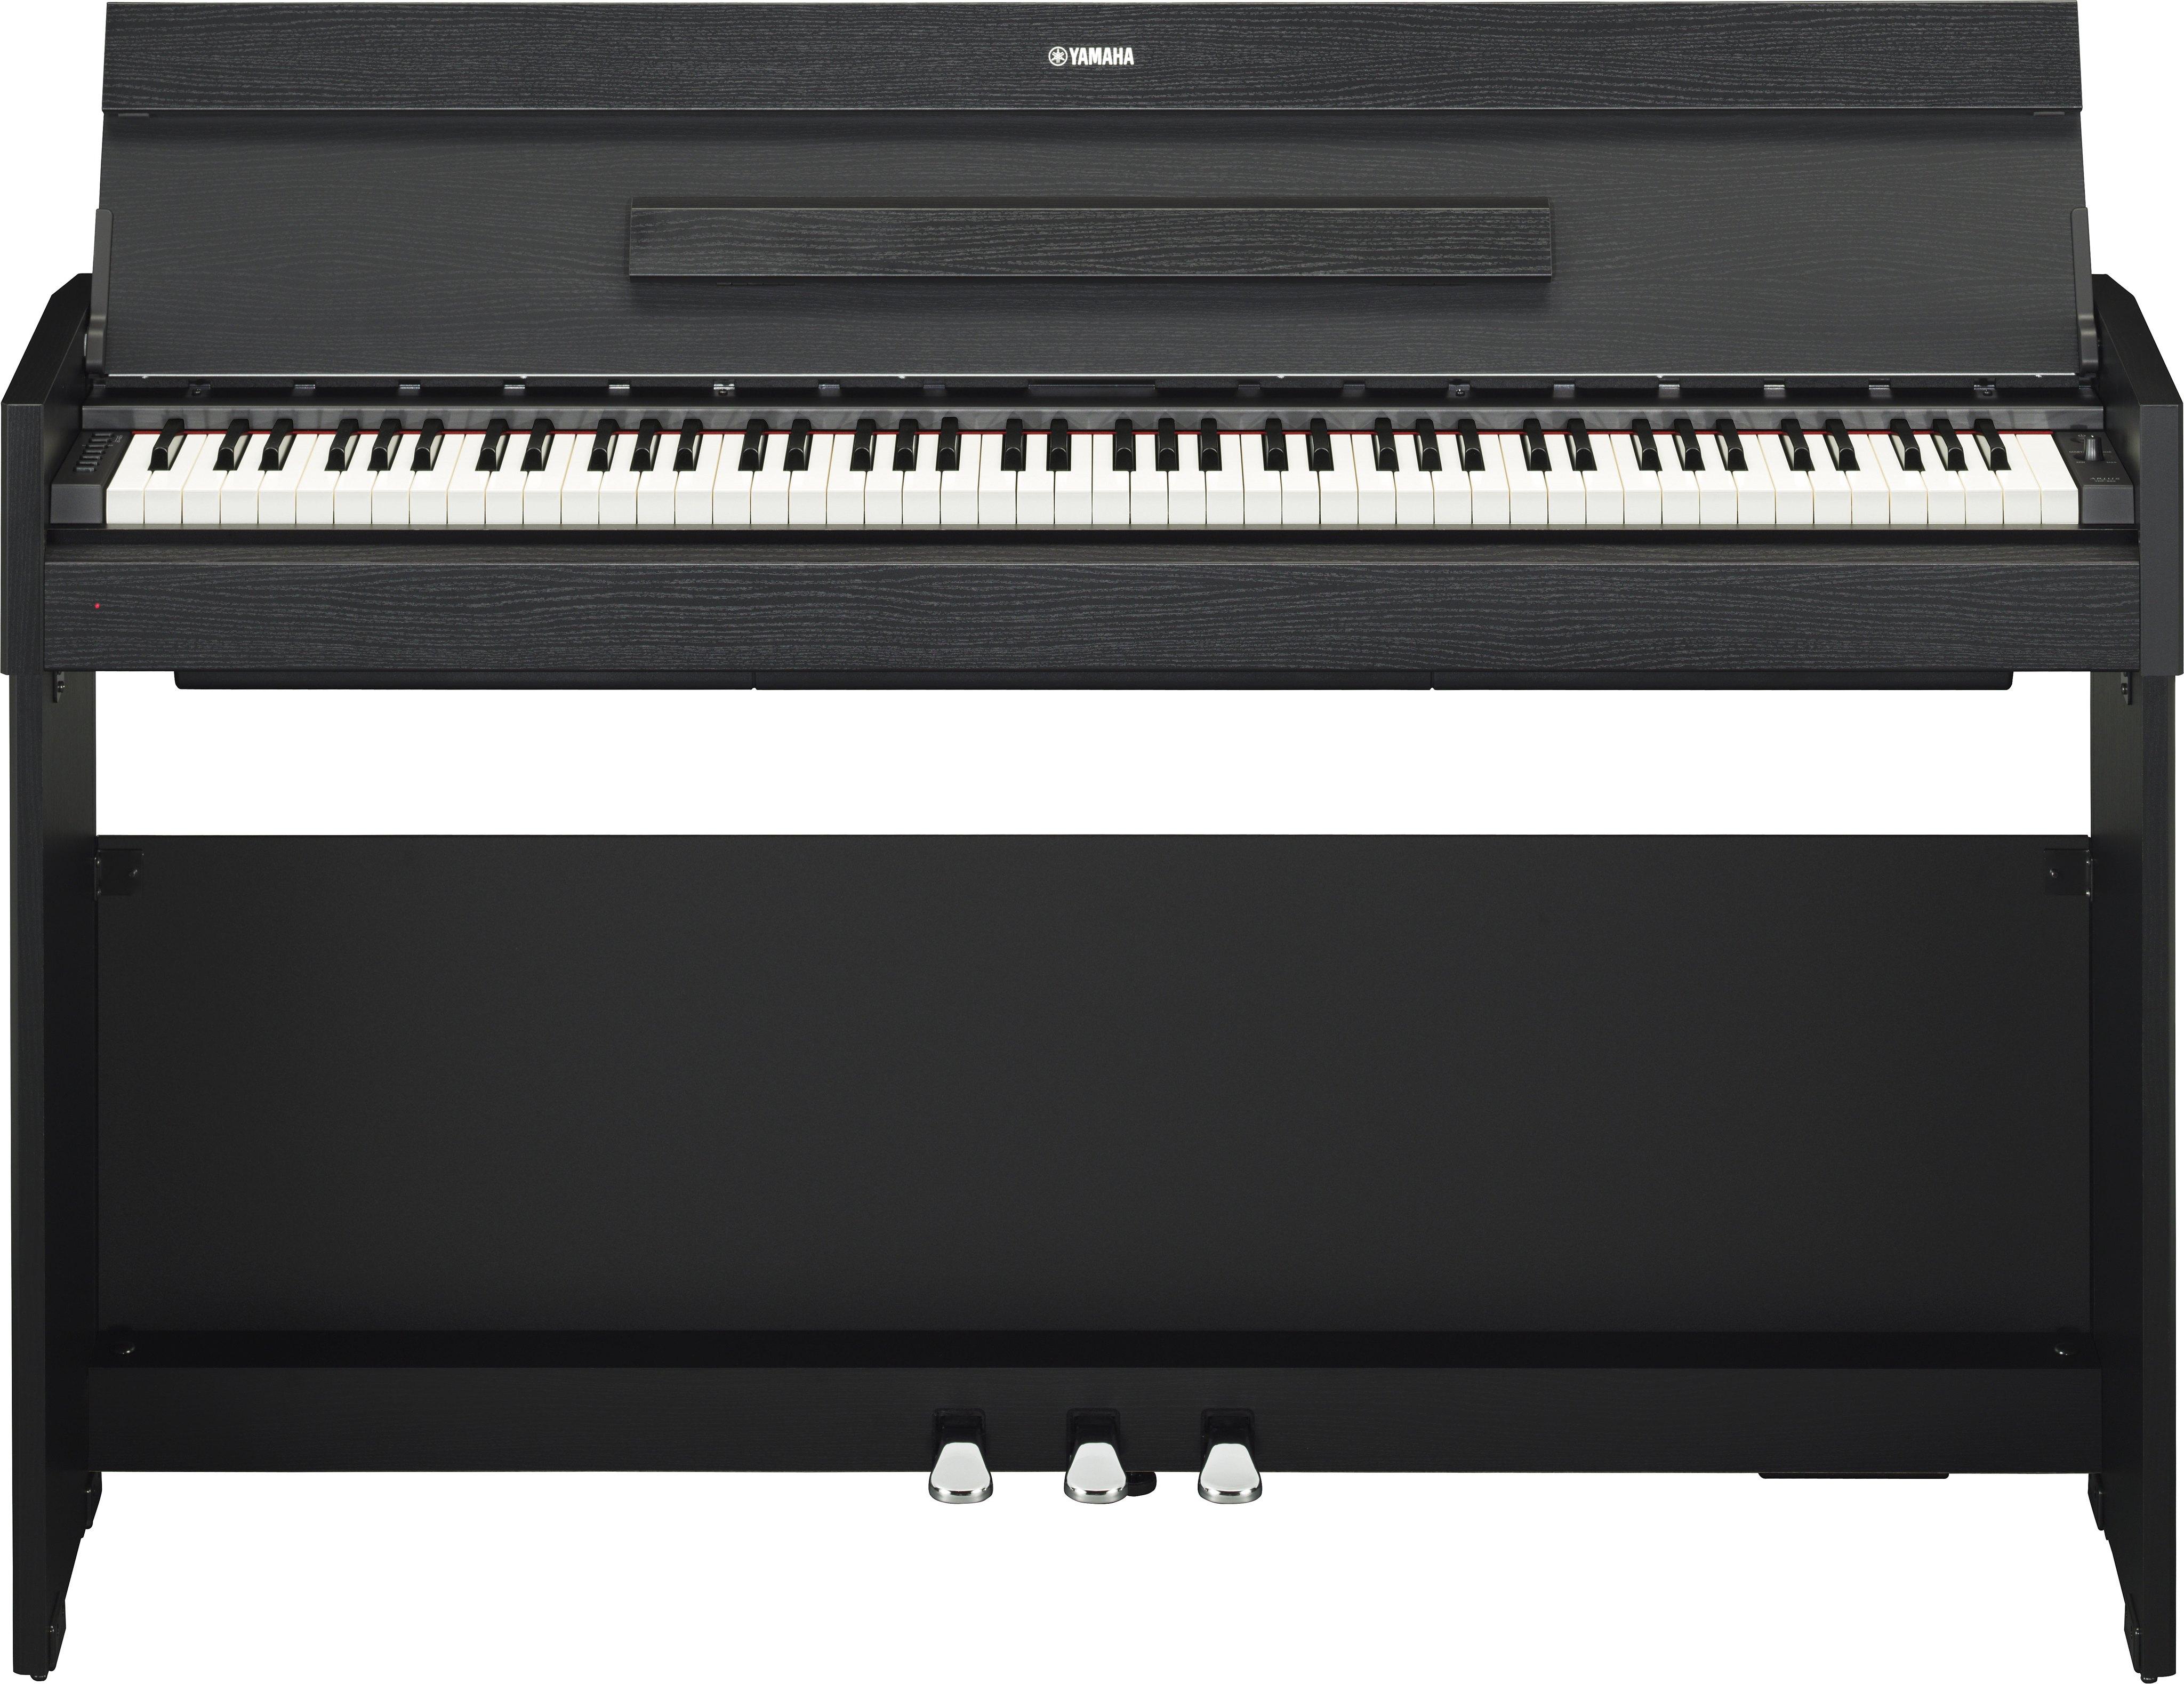 E Piano Yamaha : ydp s52 overview arius pianos musical instruments products yamaha canada english ~ Aude.kayakingforconservation.com Haus und Dekorationen